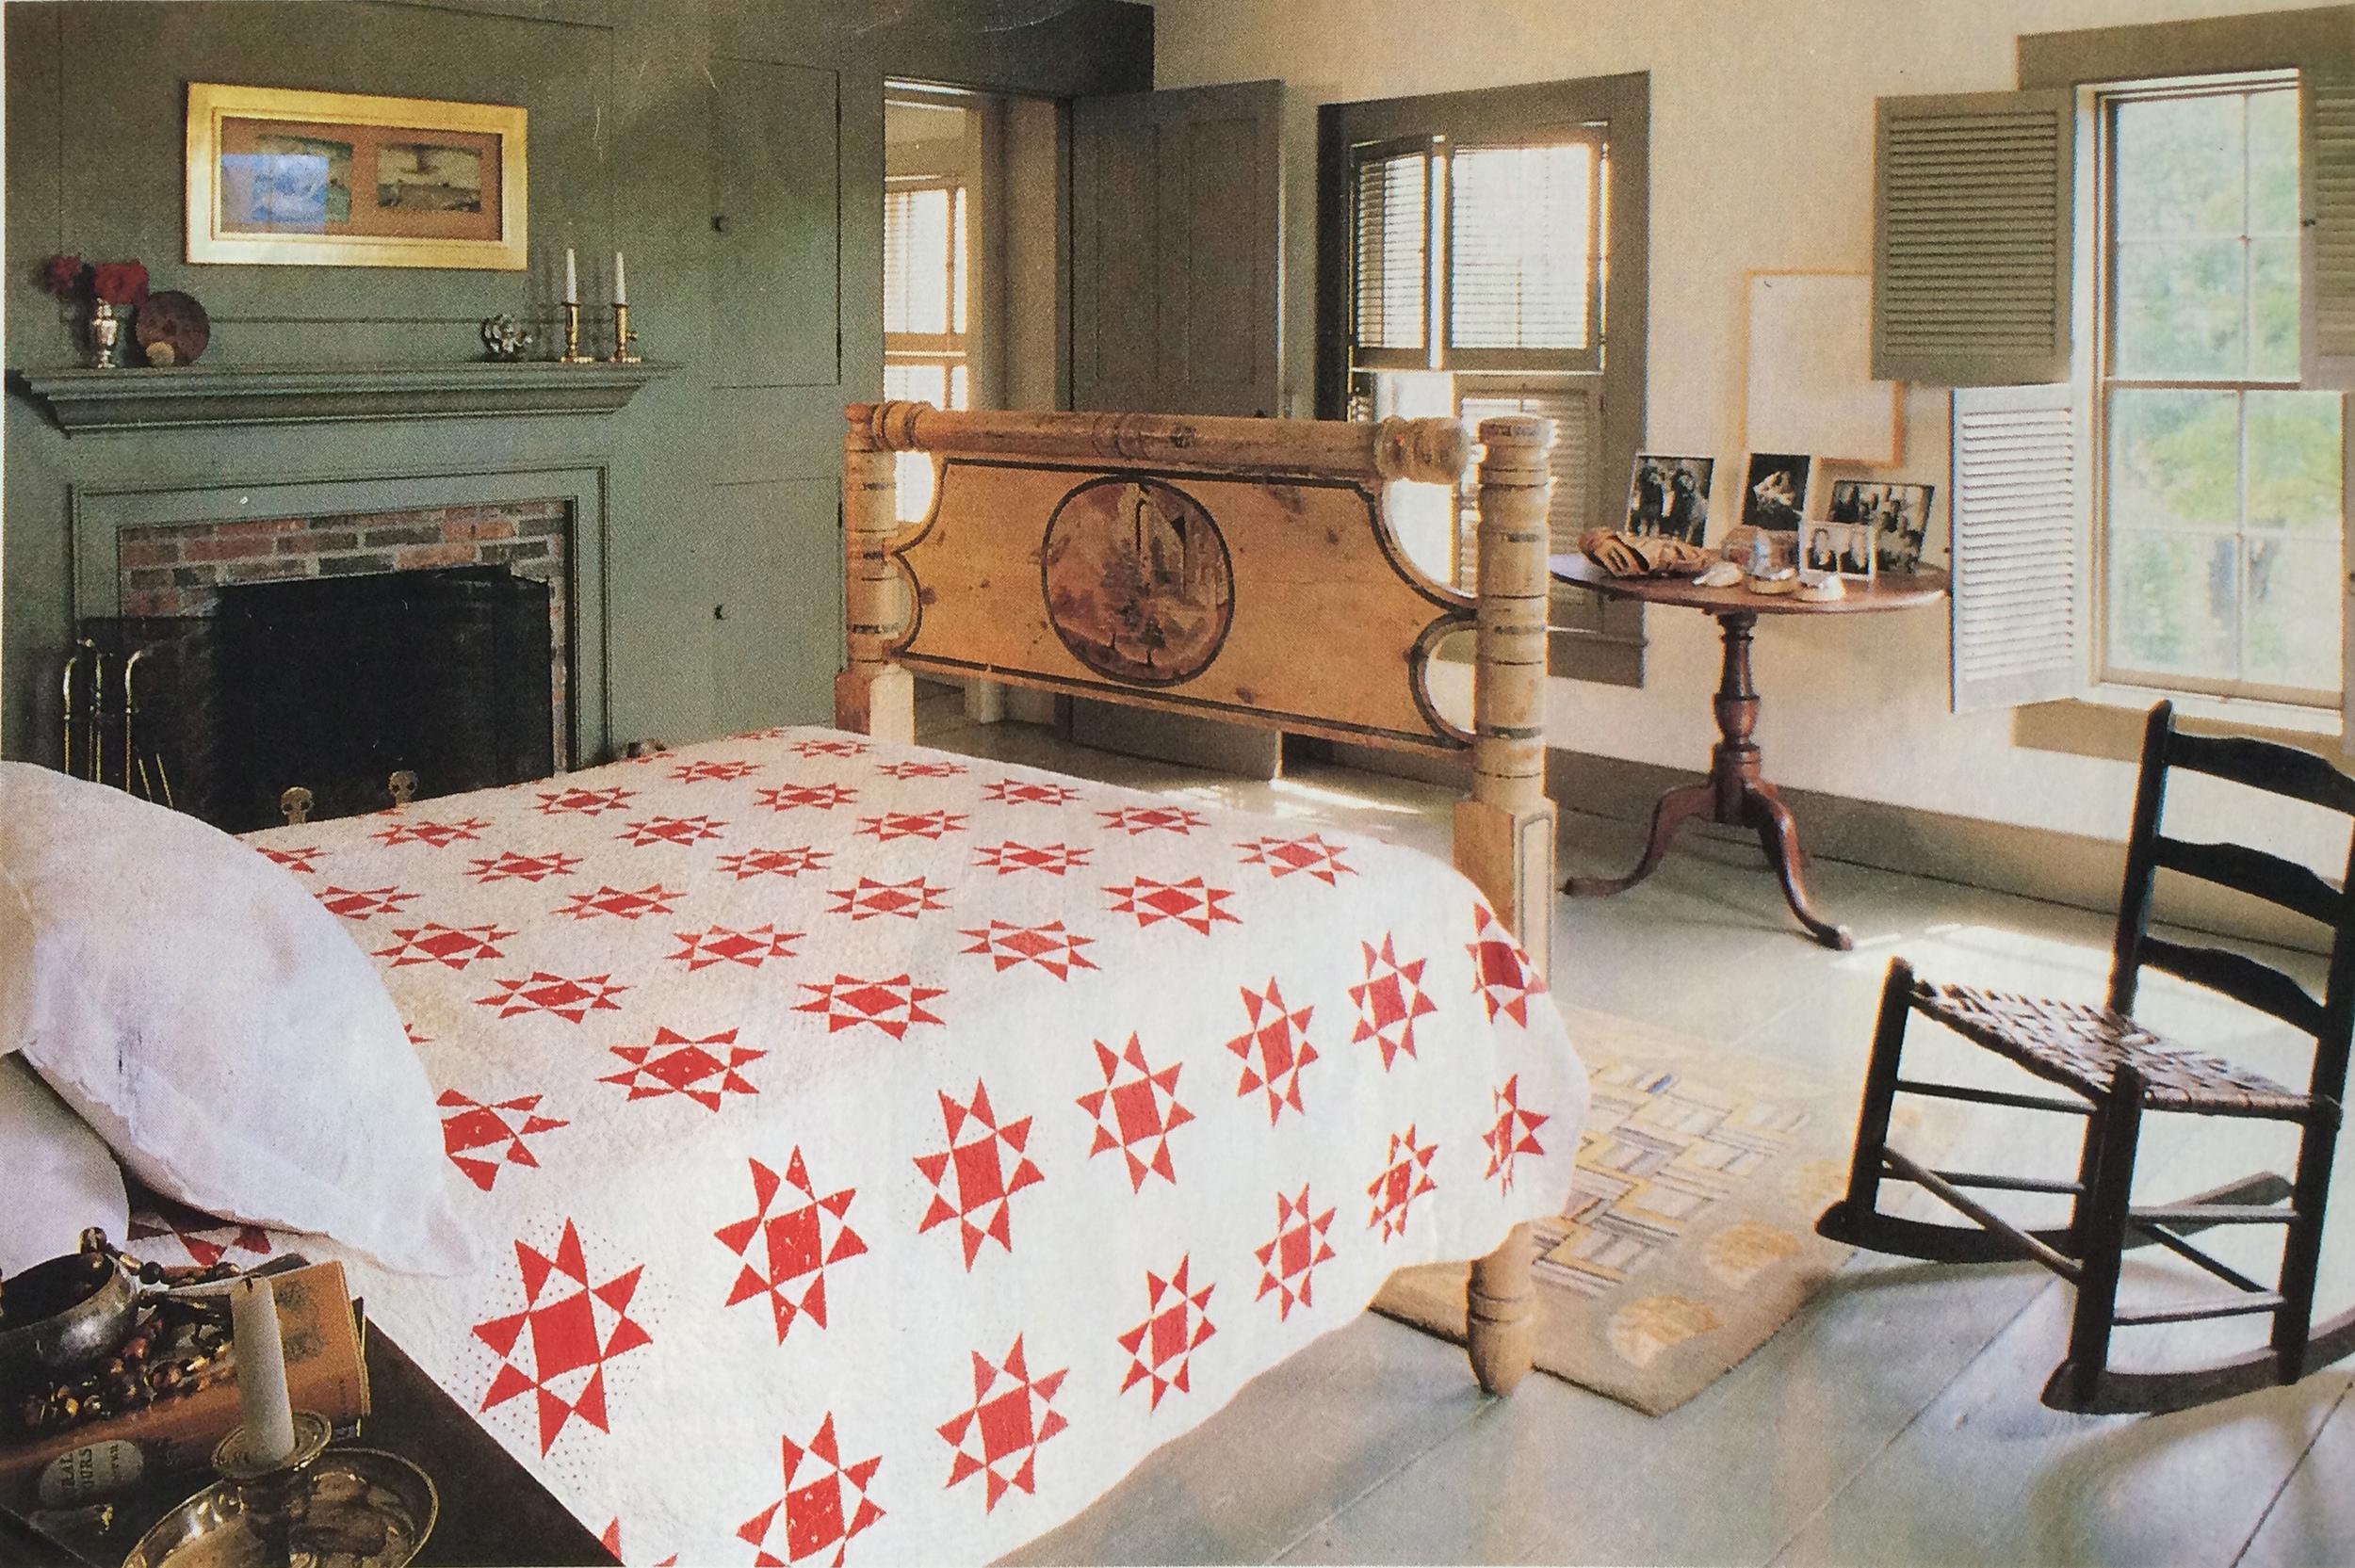 home belonging to Jason Pollock, nephew of the artist Jackson